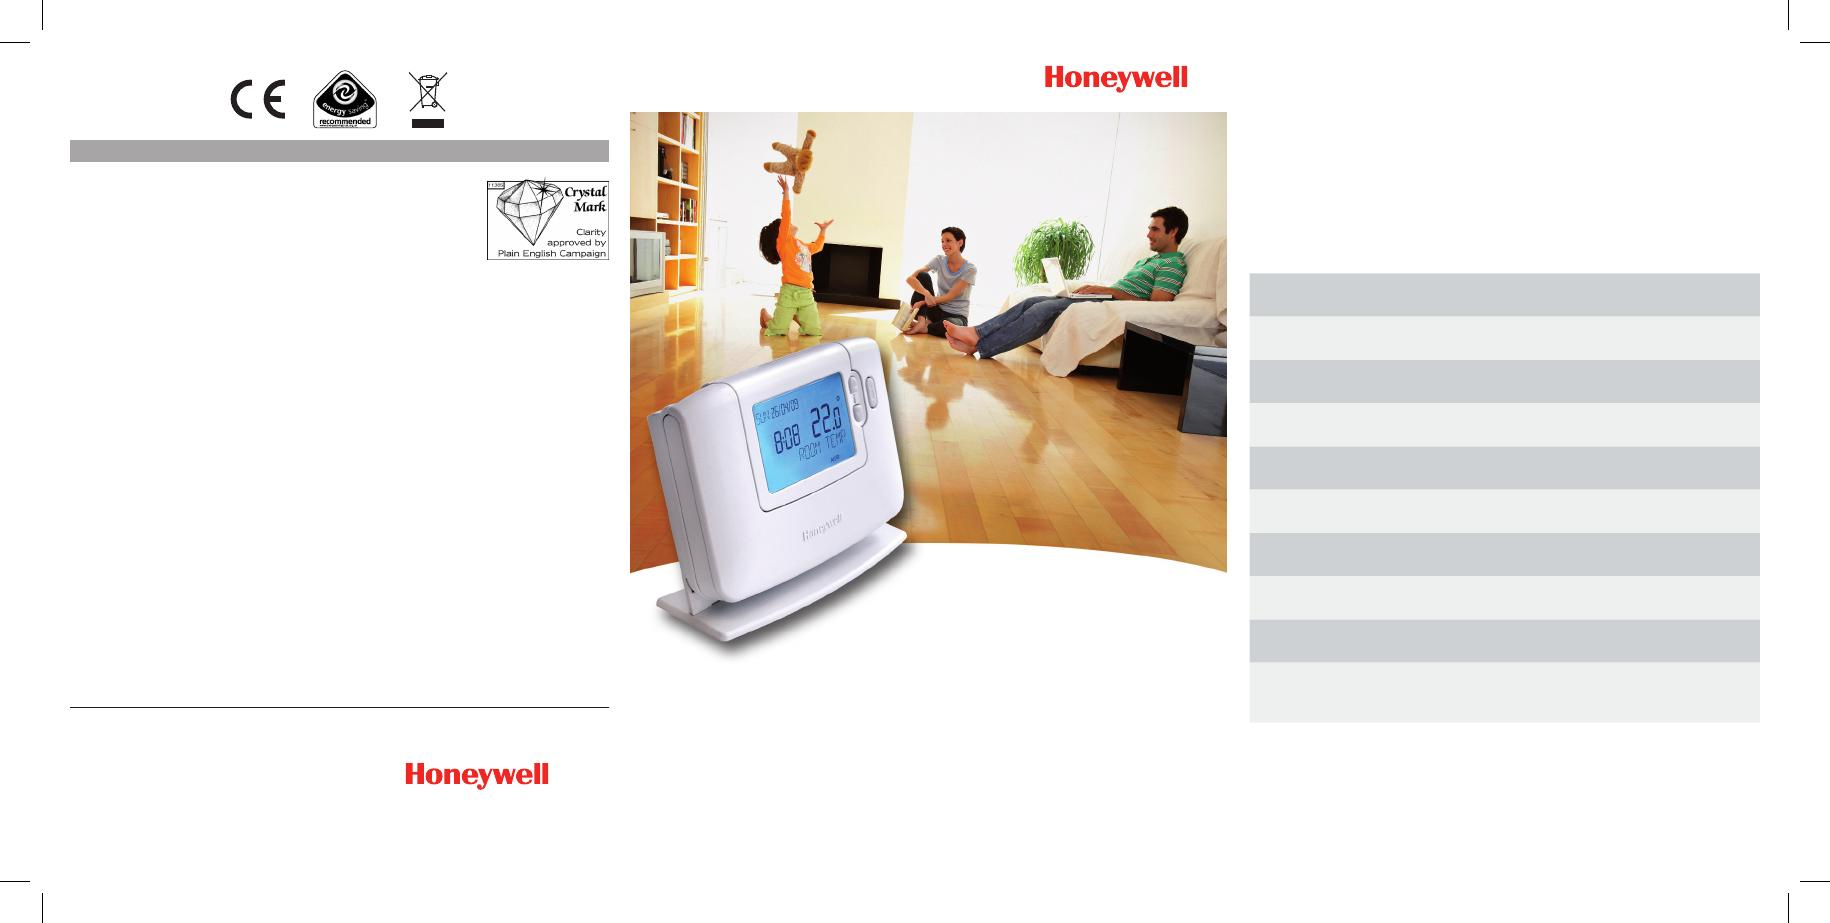 handleiding honeywell cm 921 pagina 1 van 18 english rh gebruikershandleiding com Honeywell Programmable Thermostat Manual PDF honeywell cm921 user guide